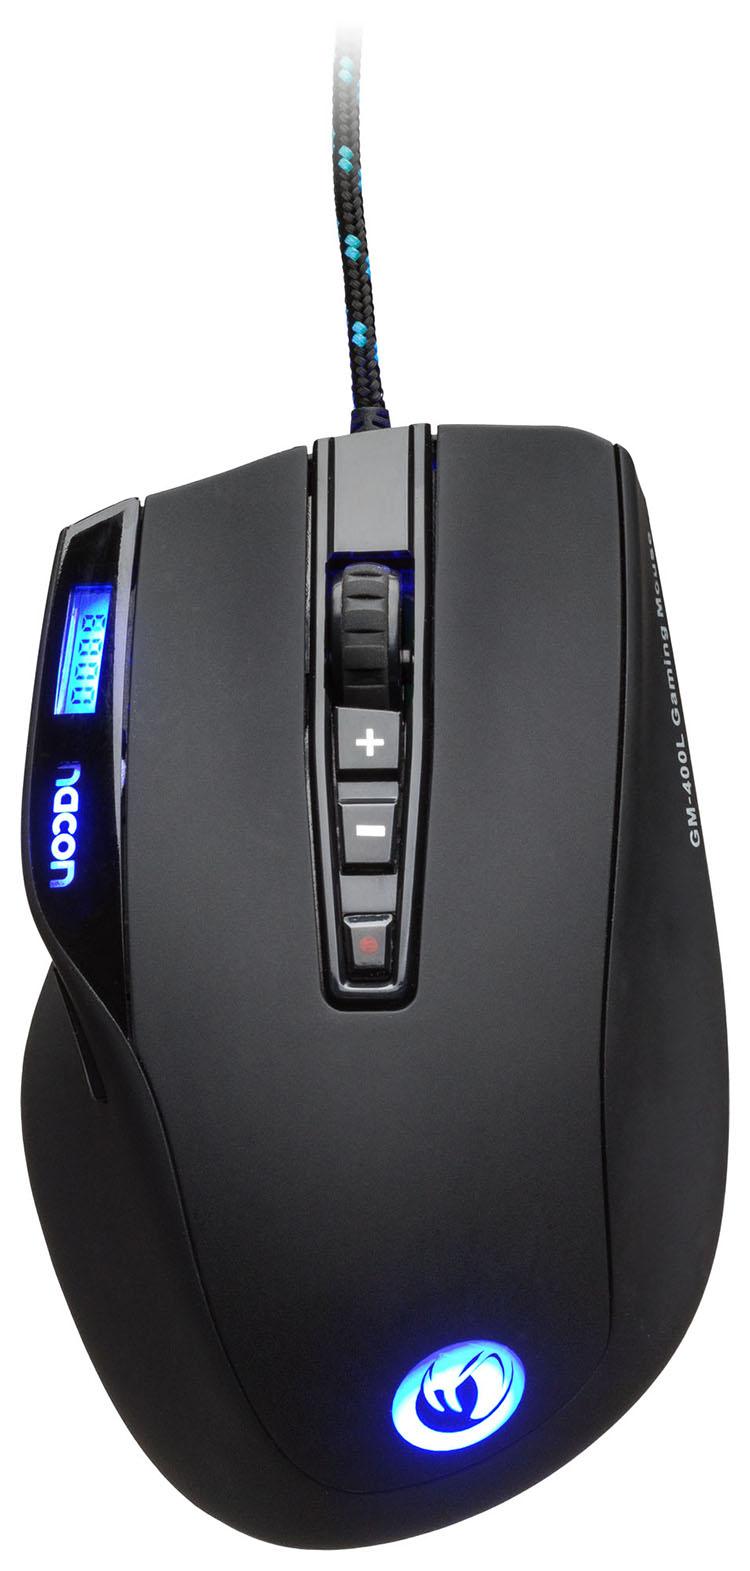 NACON Laser Gaming Mouse - Packshot